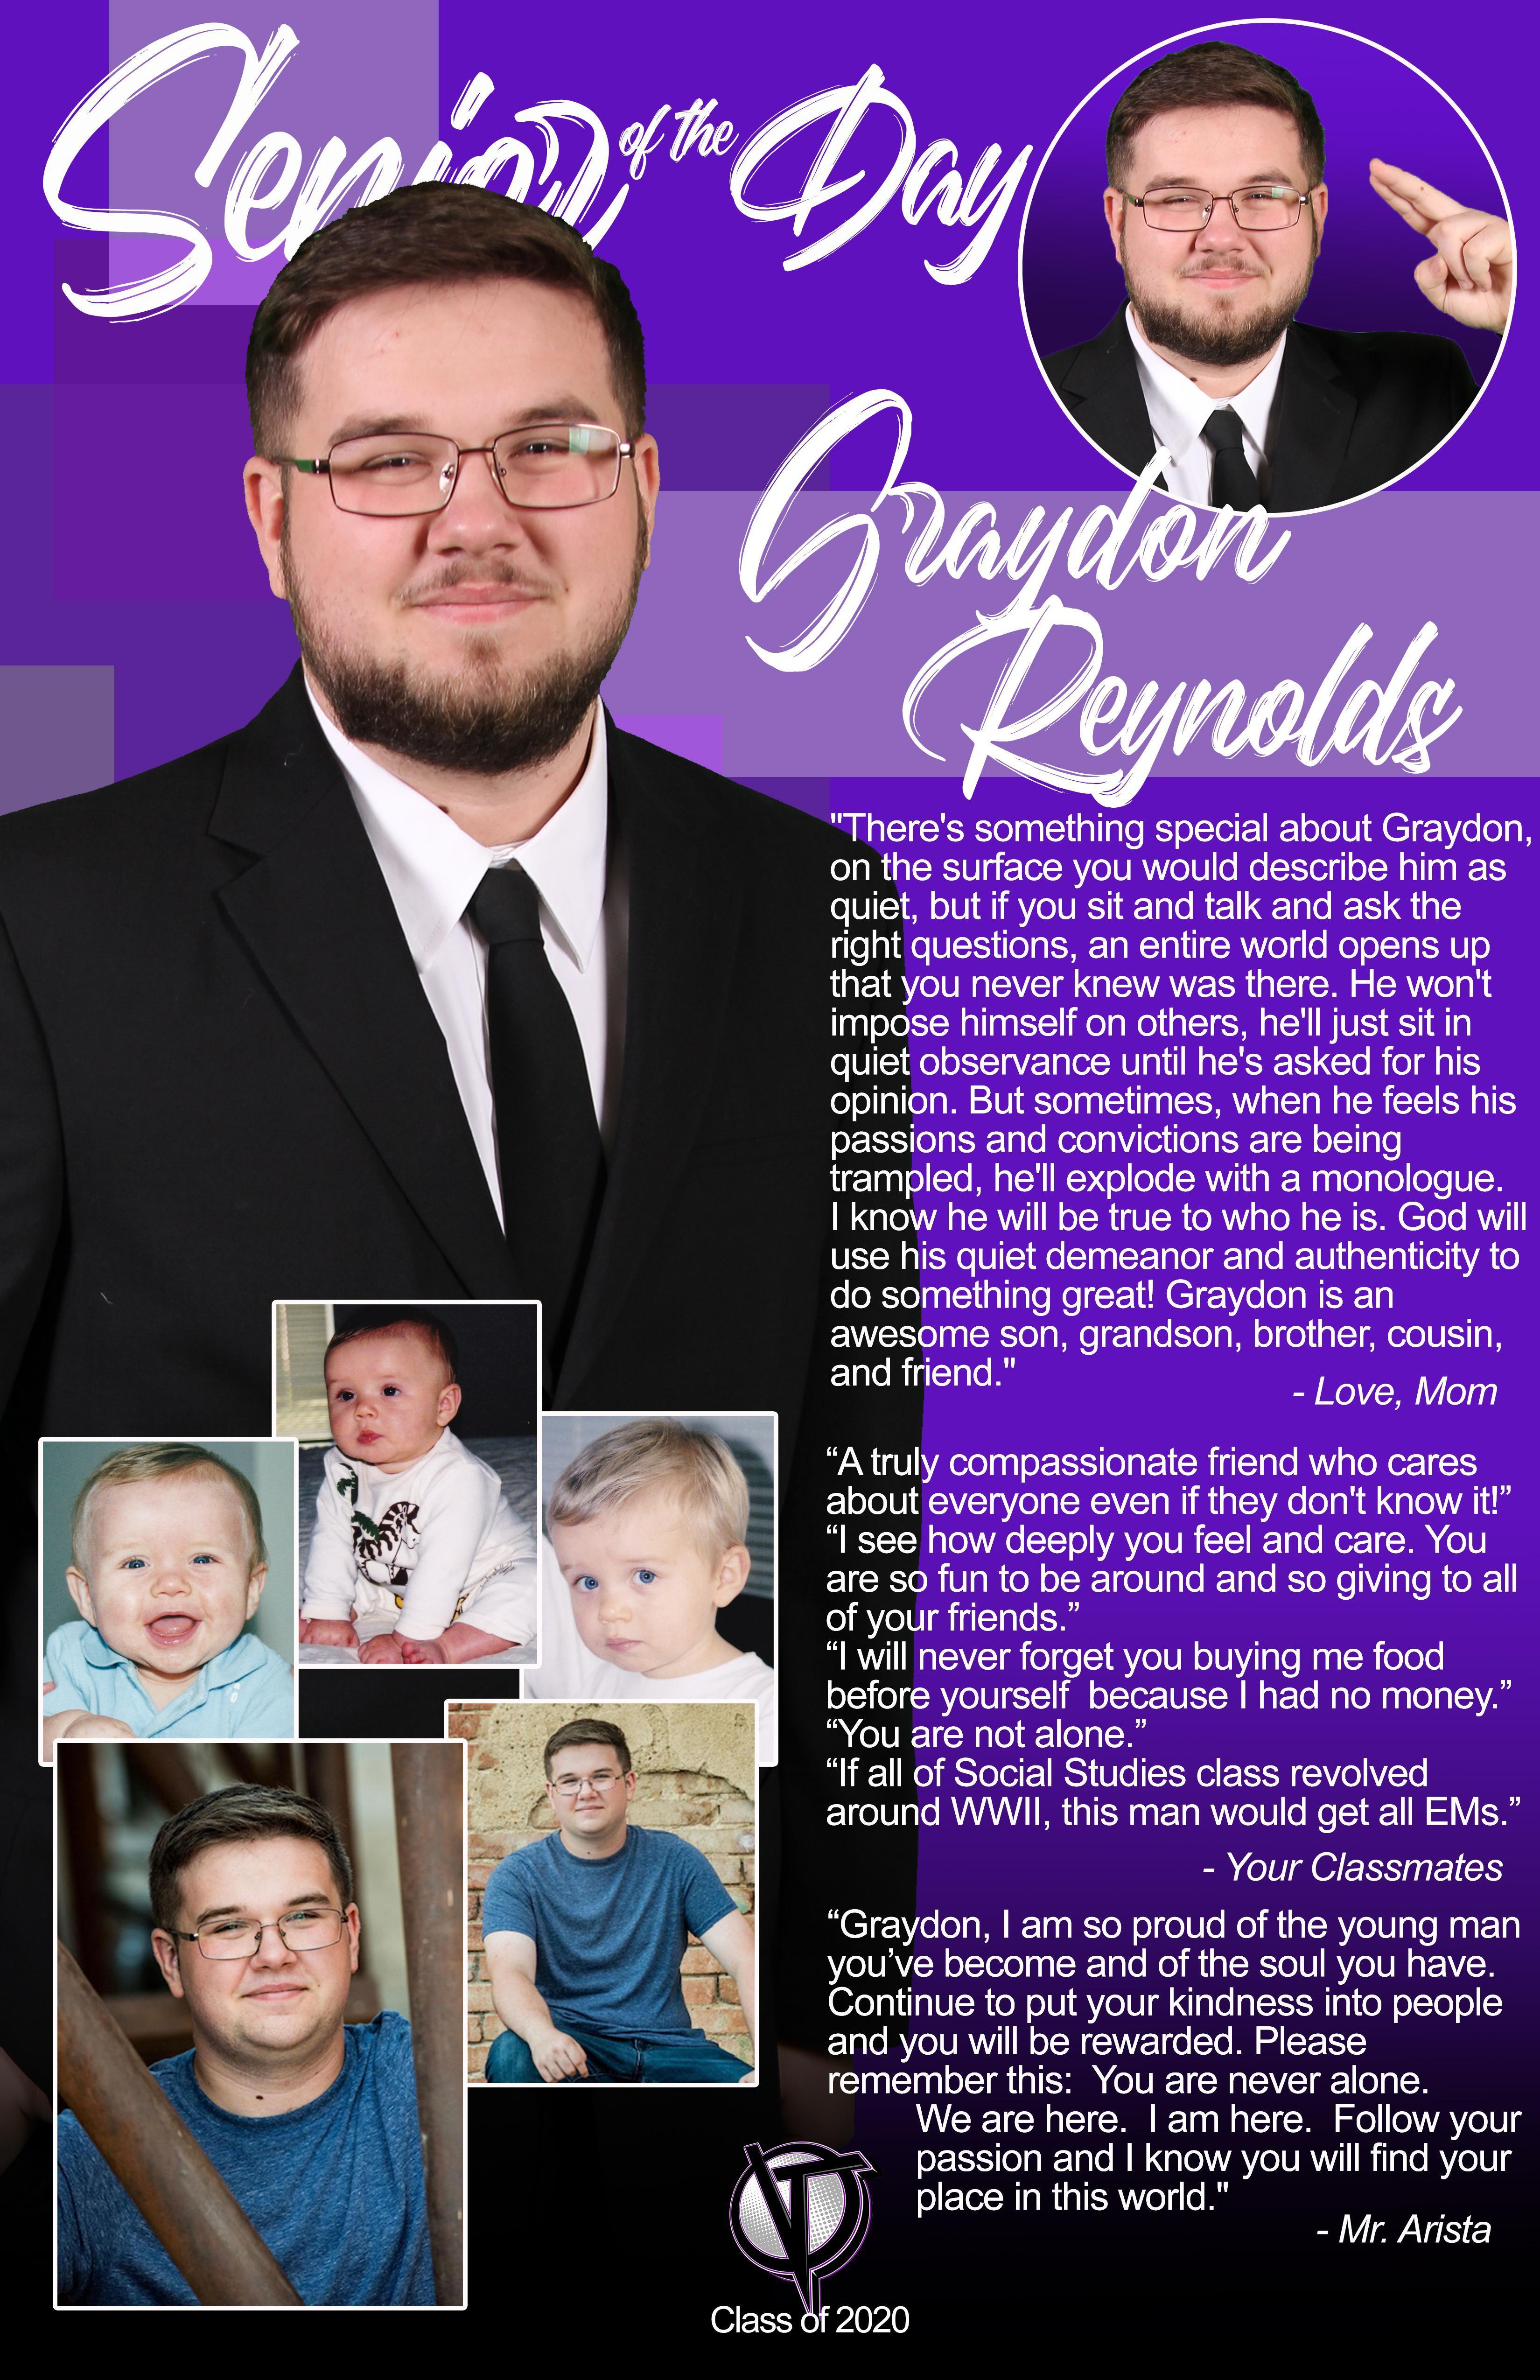 Graydon Reynolds